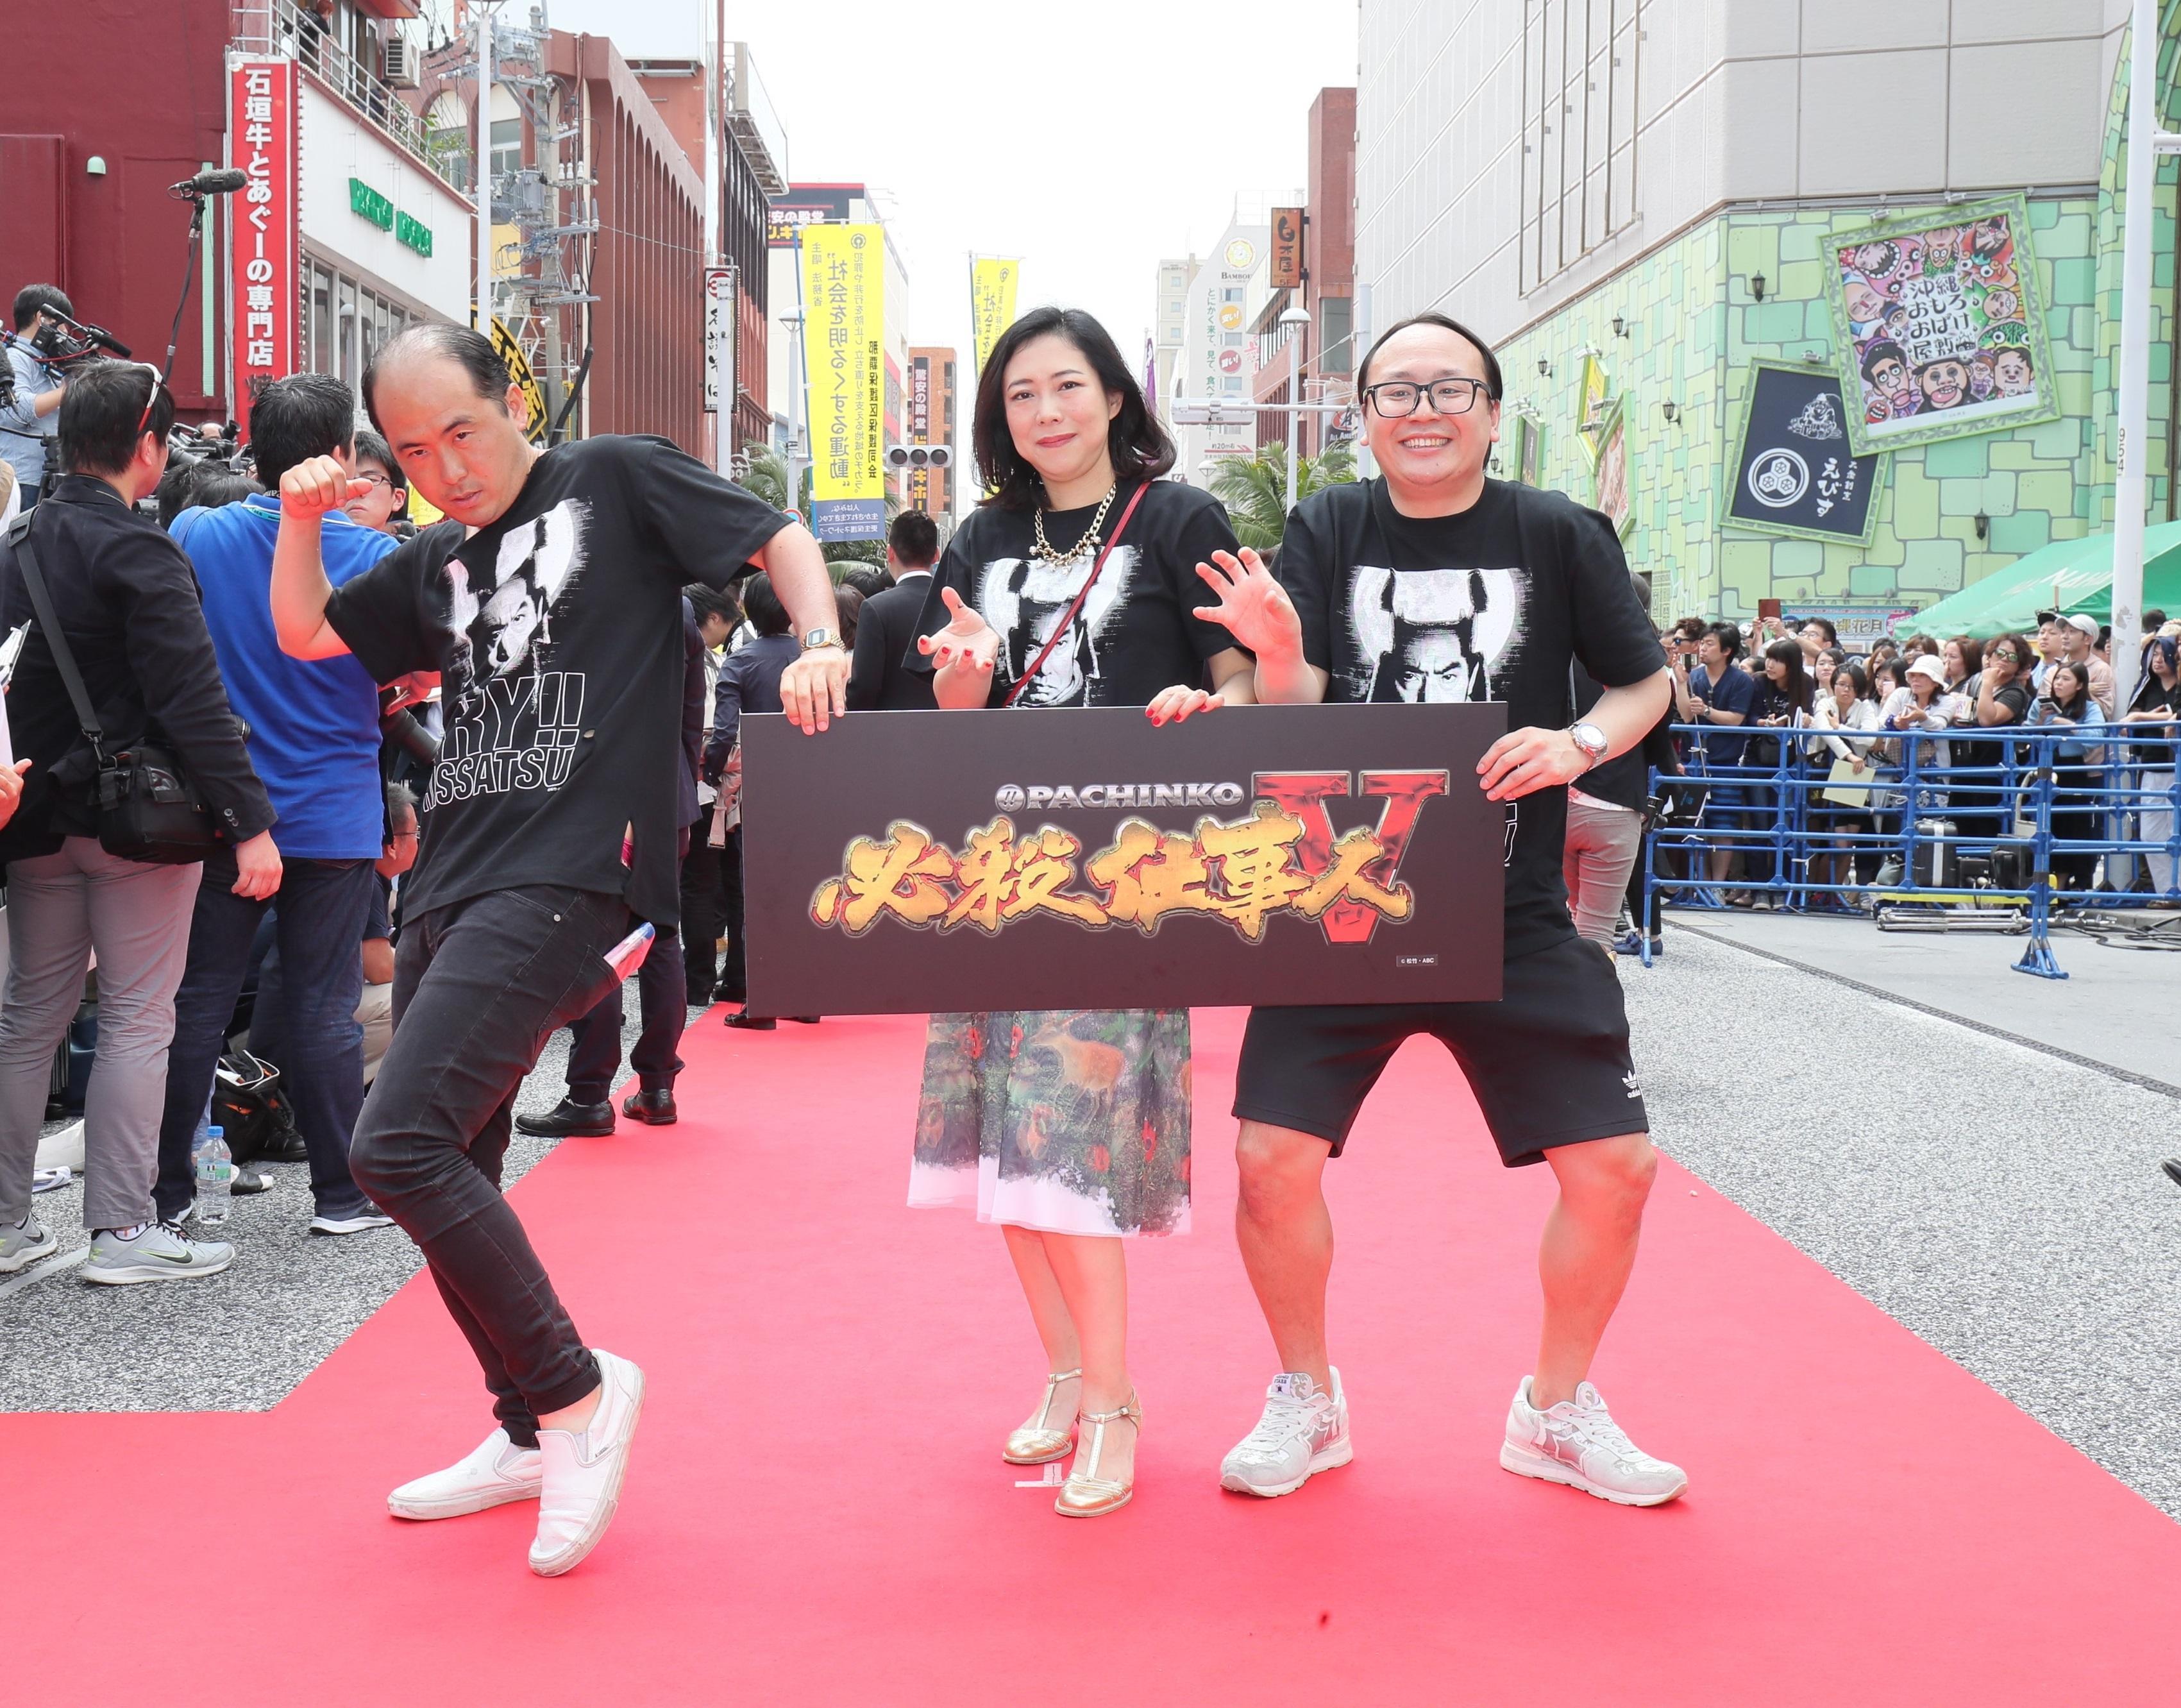 http://news.yoshimoto.co.jp/20170428173316-d7903d793711a8ca27953c469303e662fc30b422.jpg